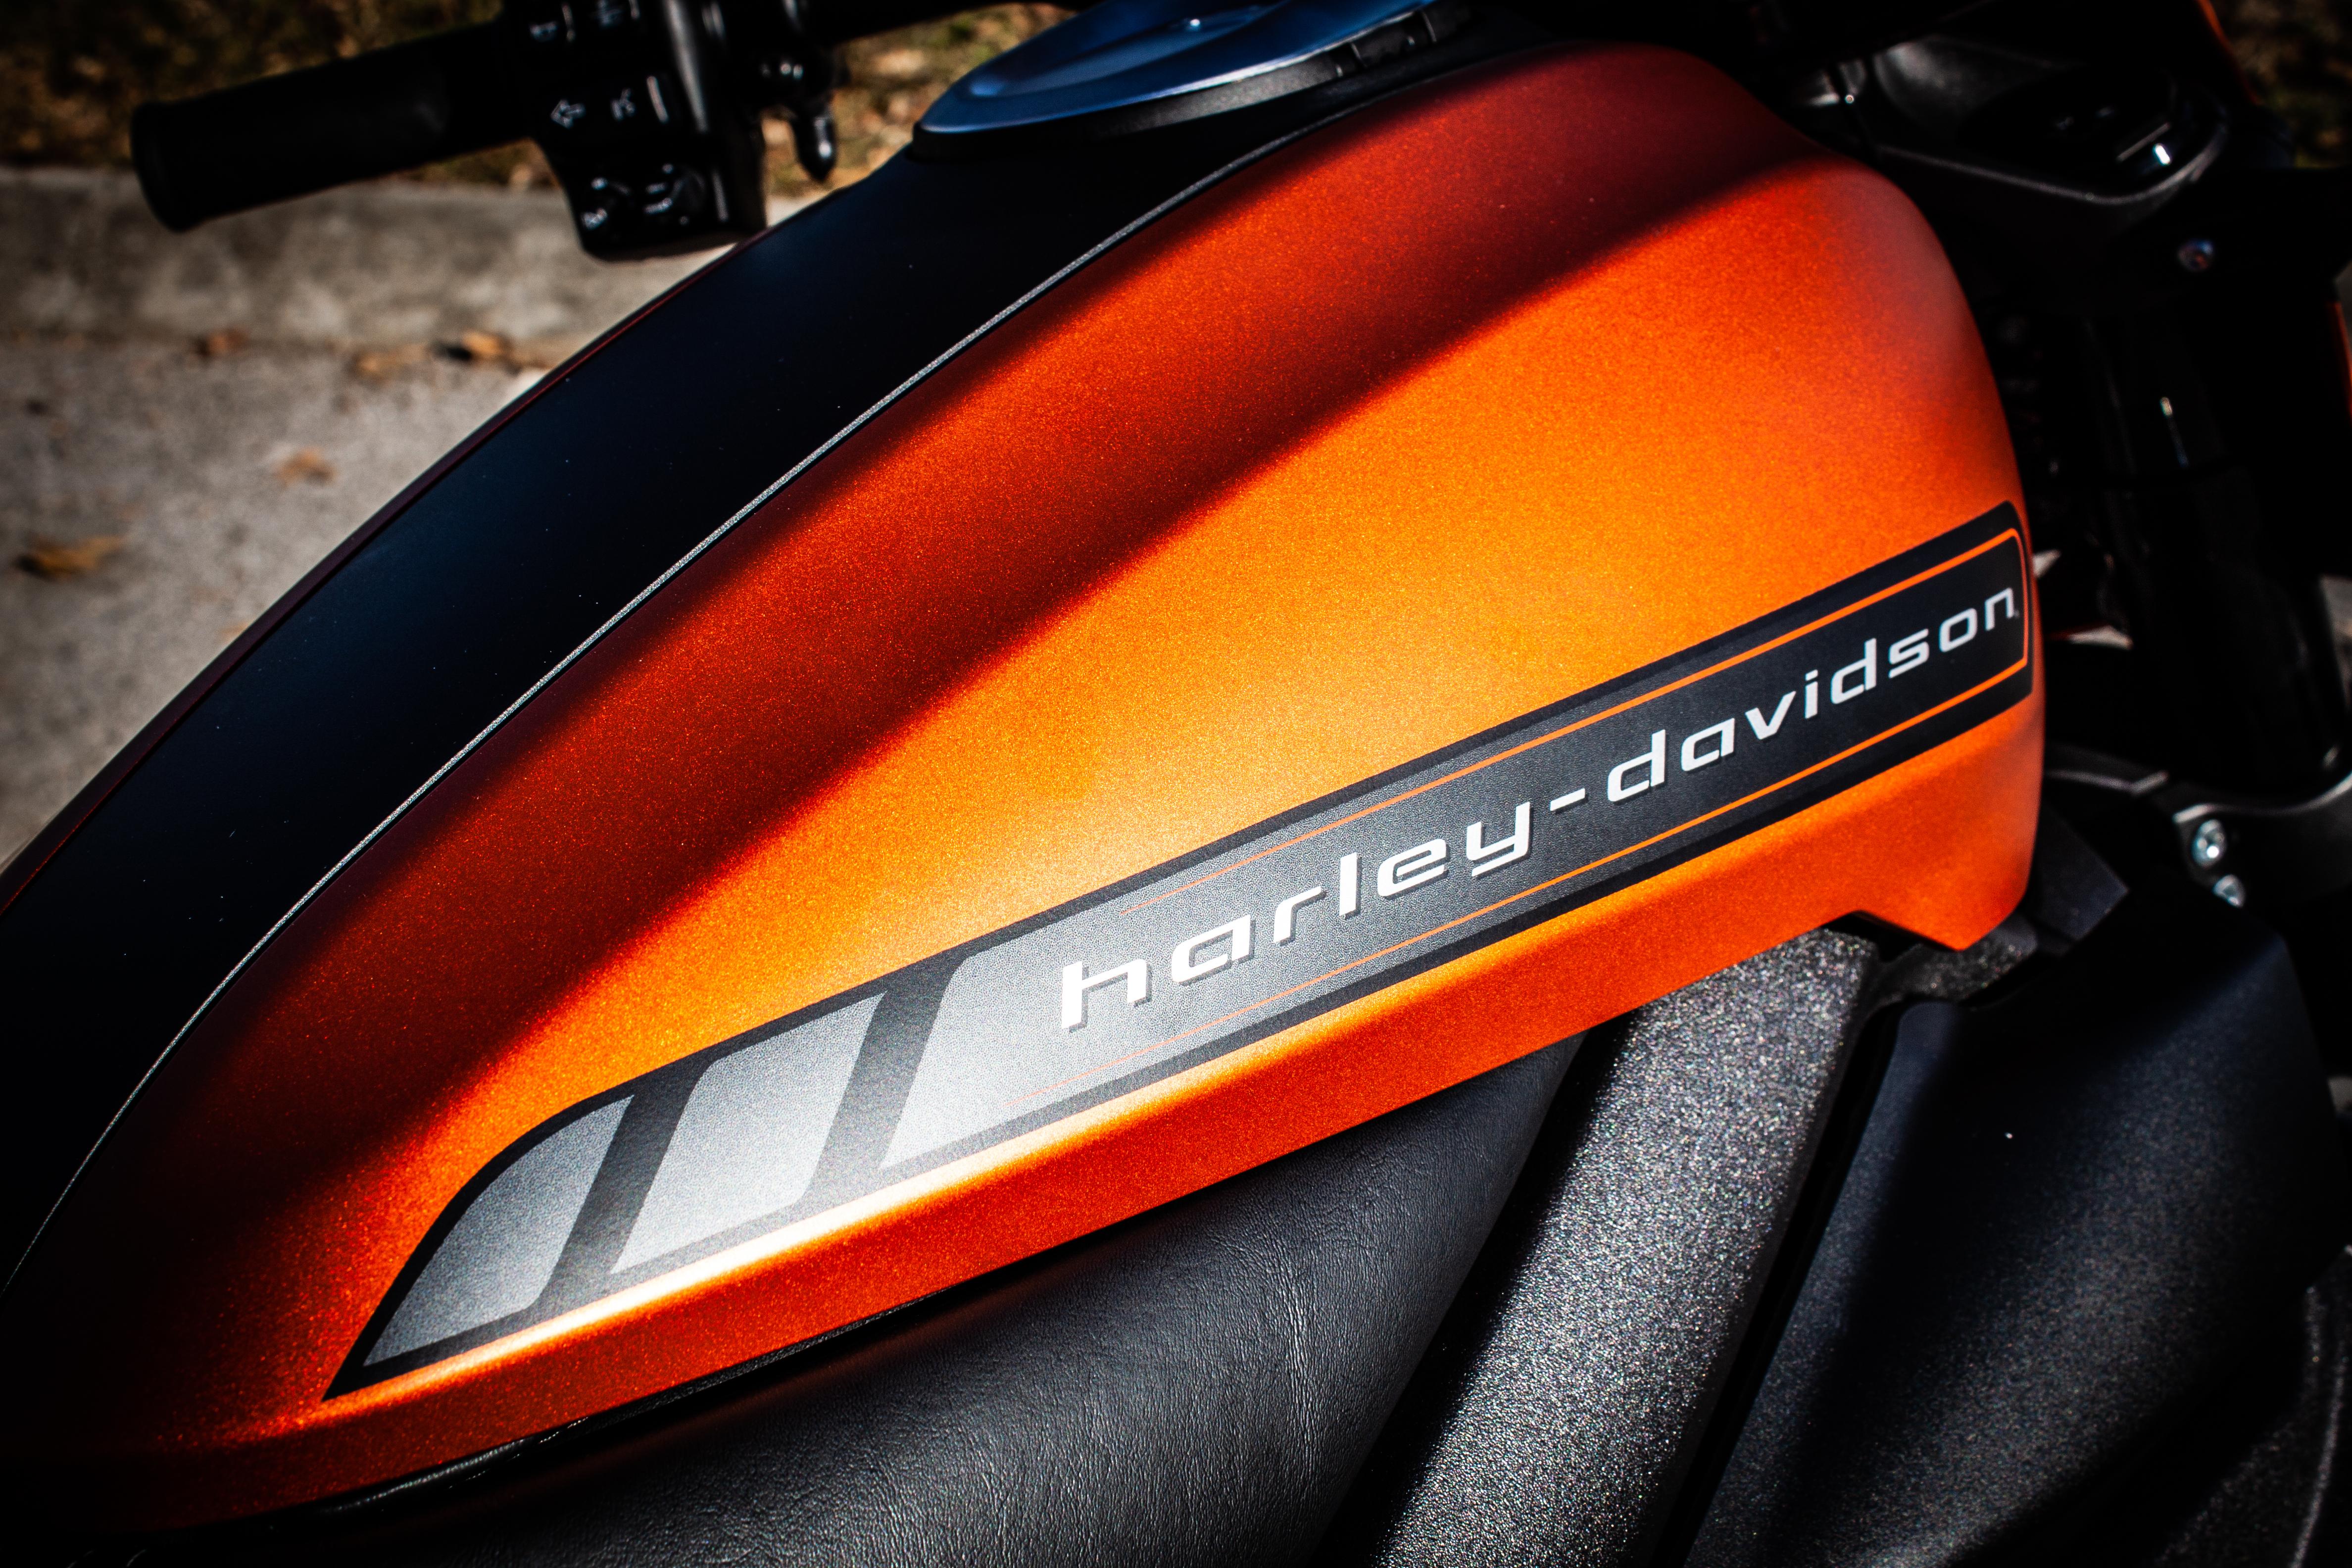 New 2020 Harley-Davidson ELW